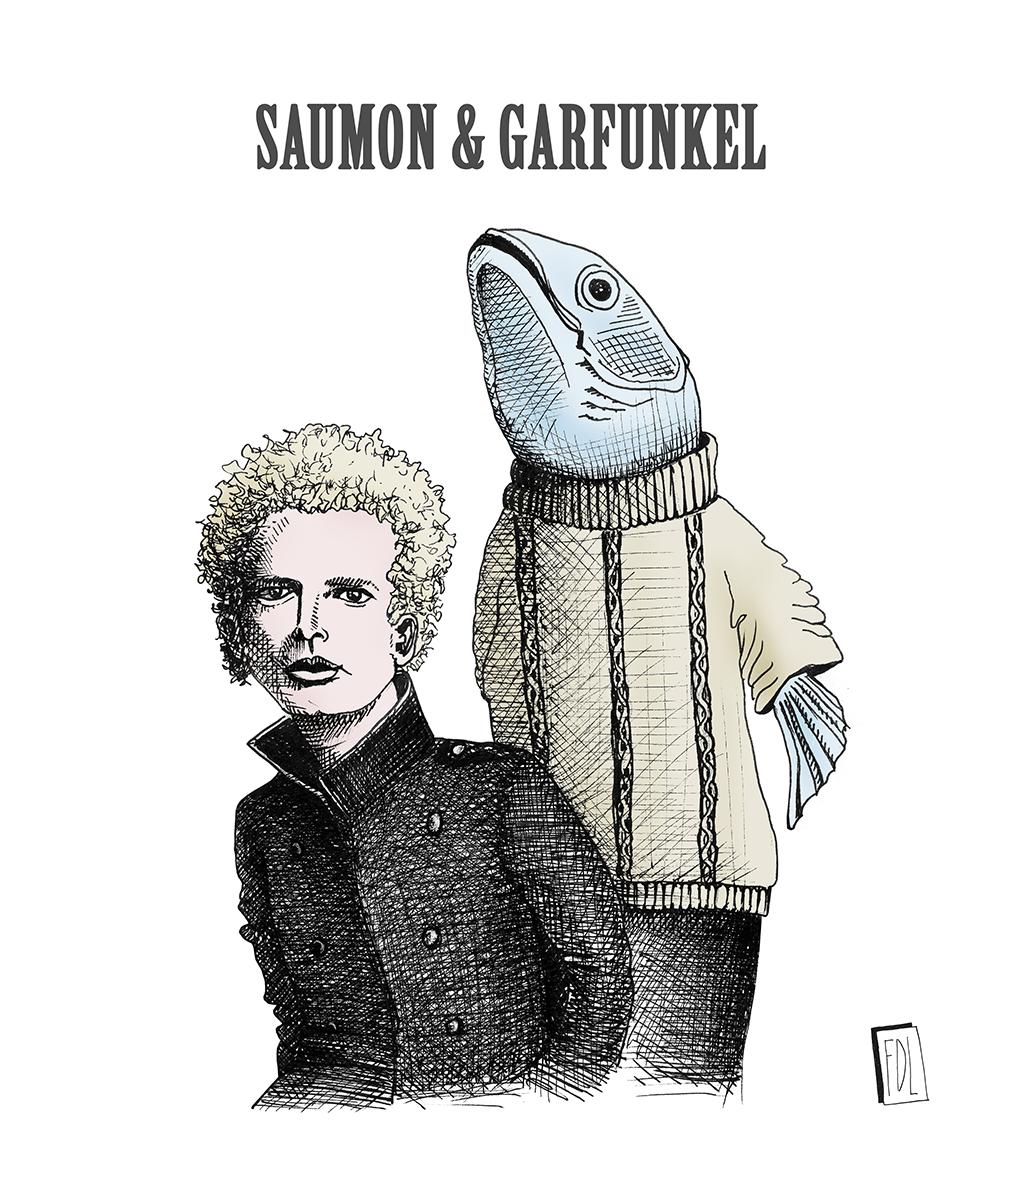 SAUMON & GARFUNKEL